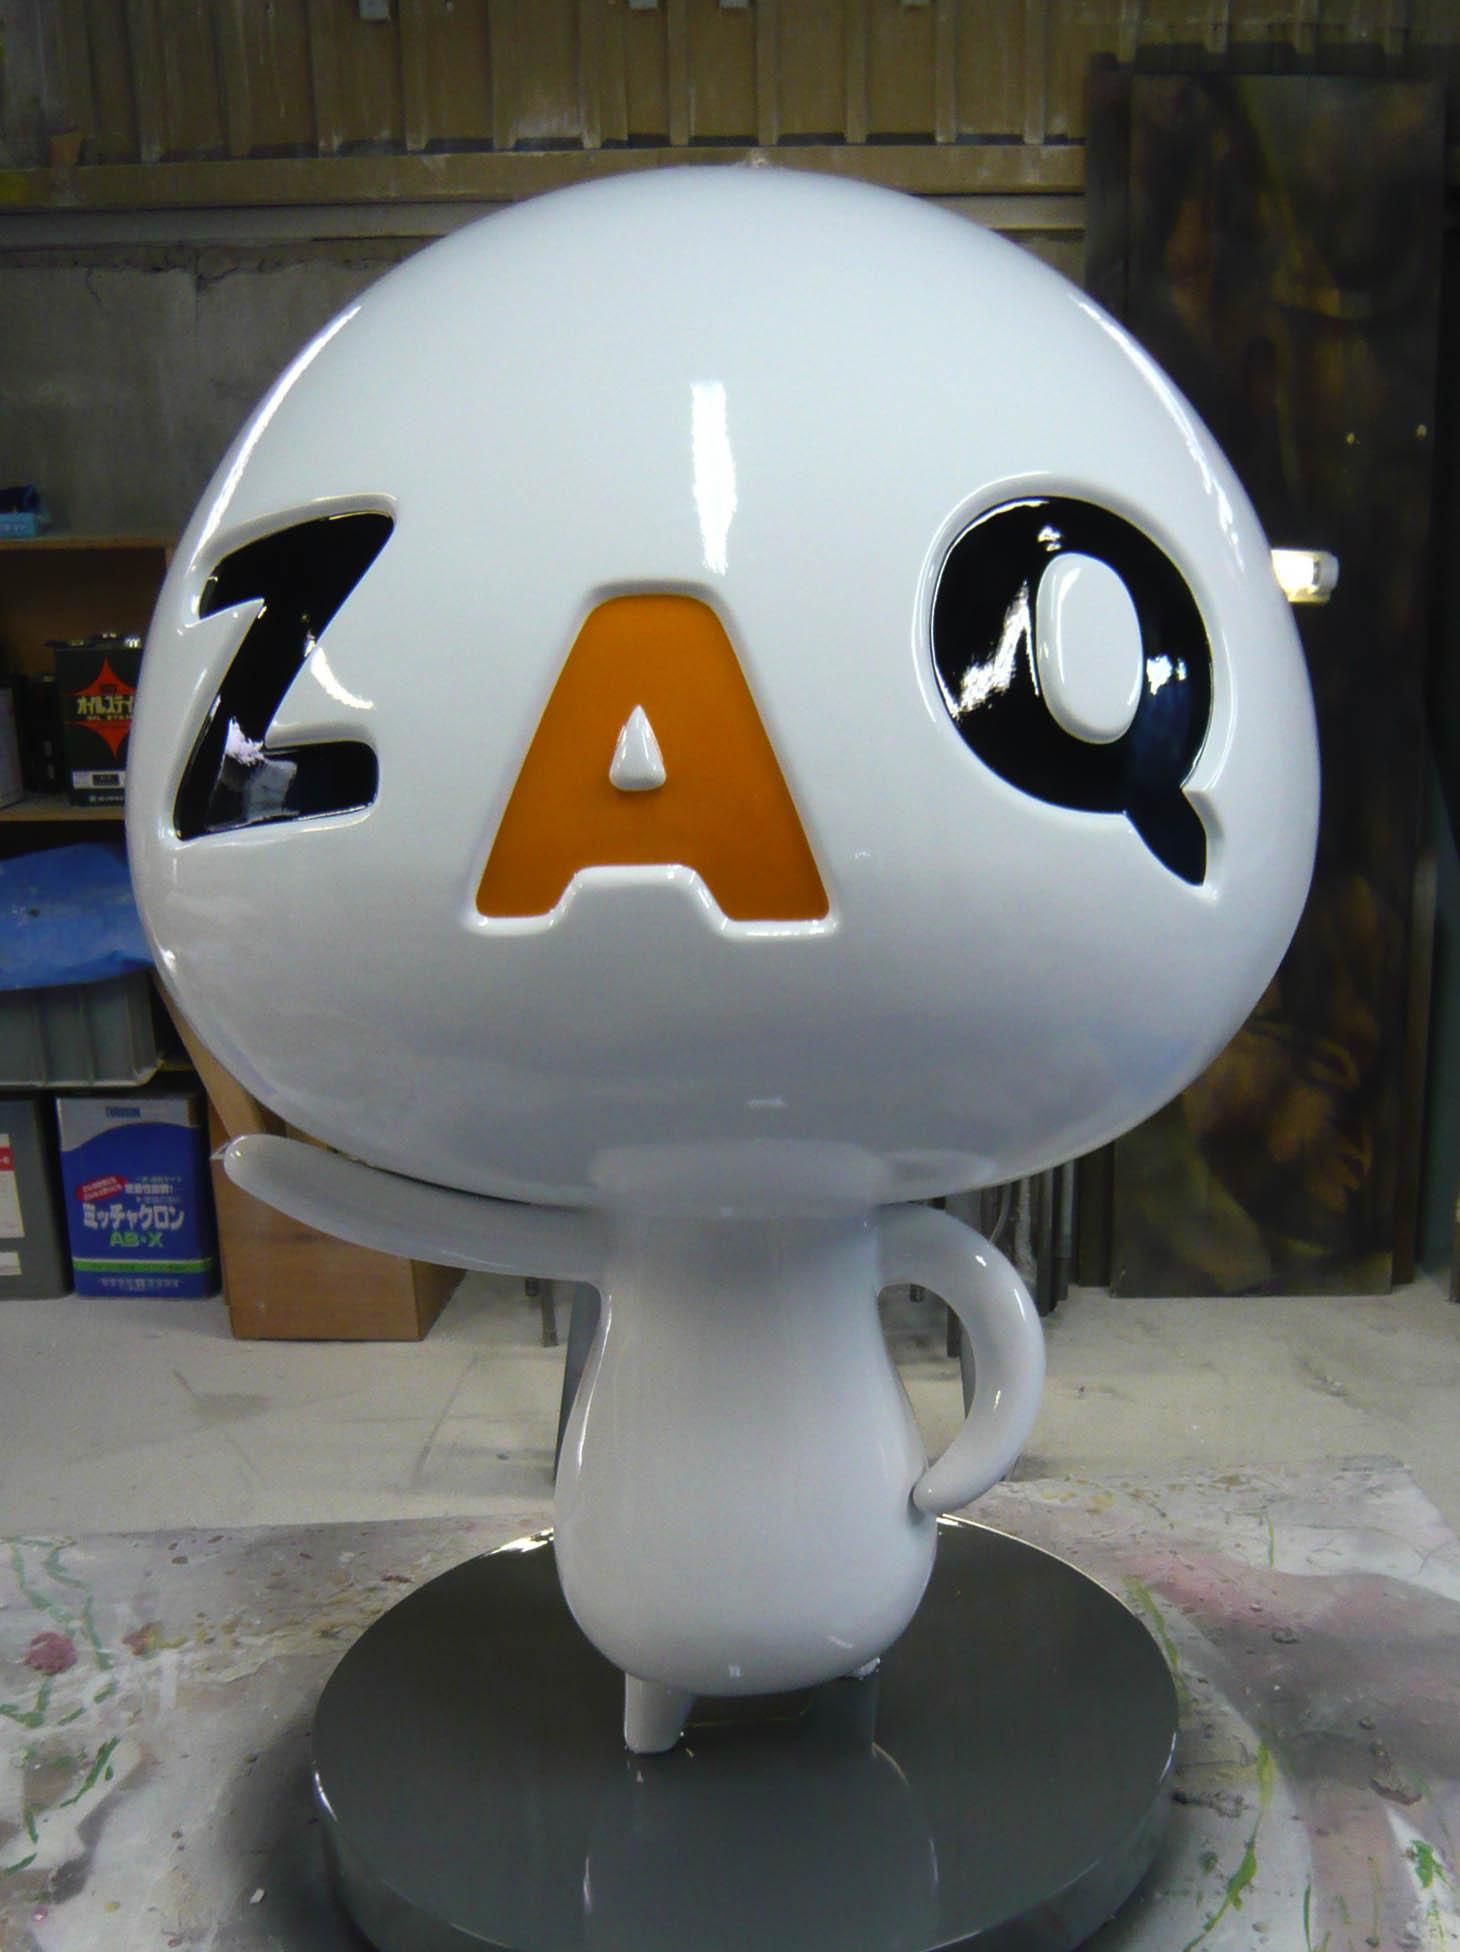 zaq|キャラクター|立体造形